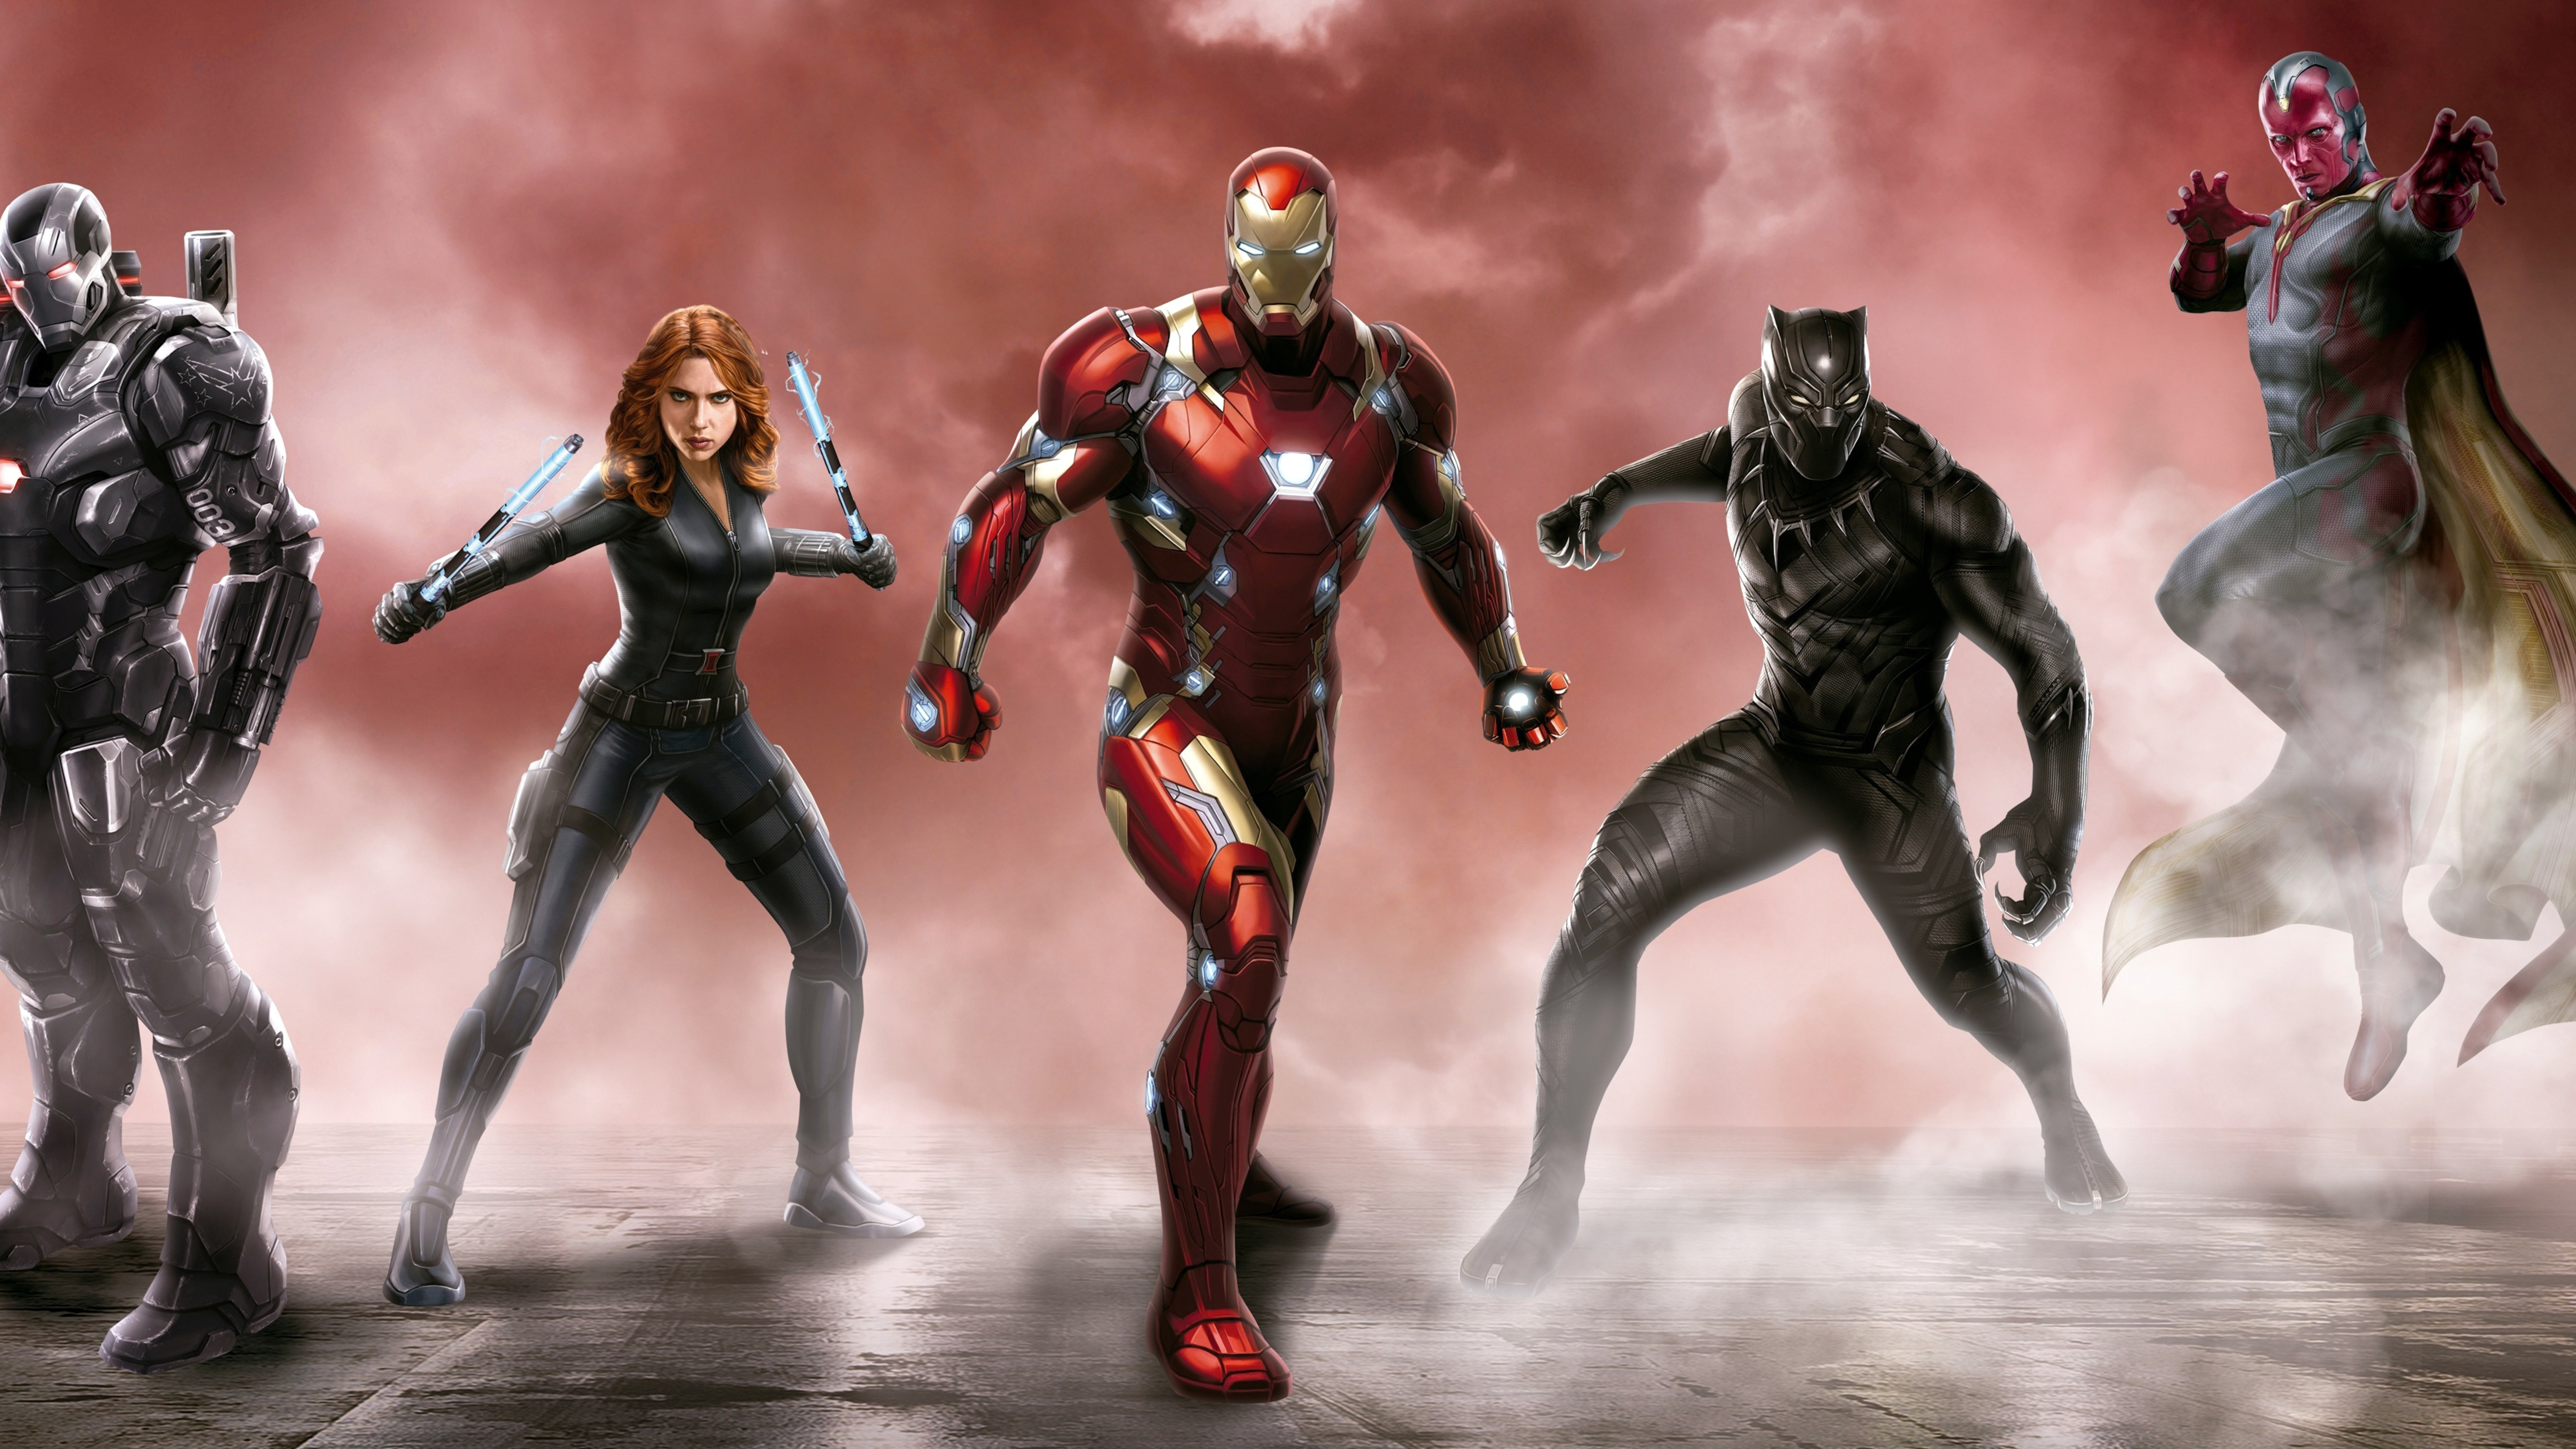 5120x2880 Captain America Civil War Best Art 5k Hd 4k Wallpapers